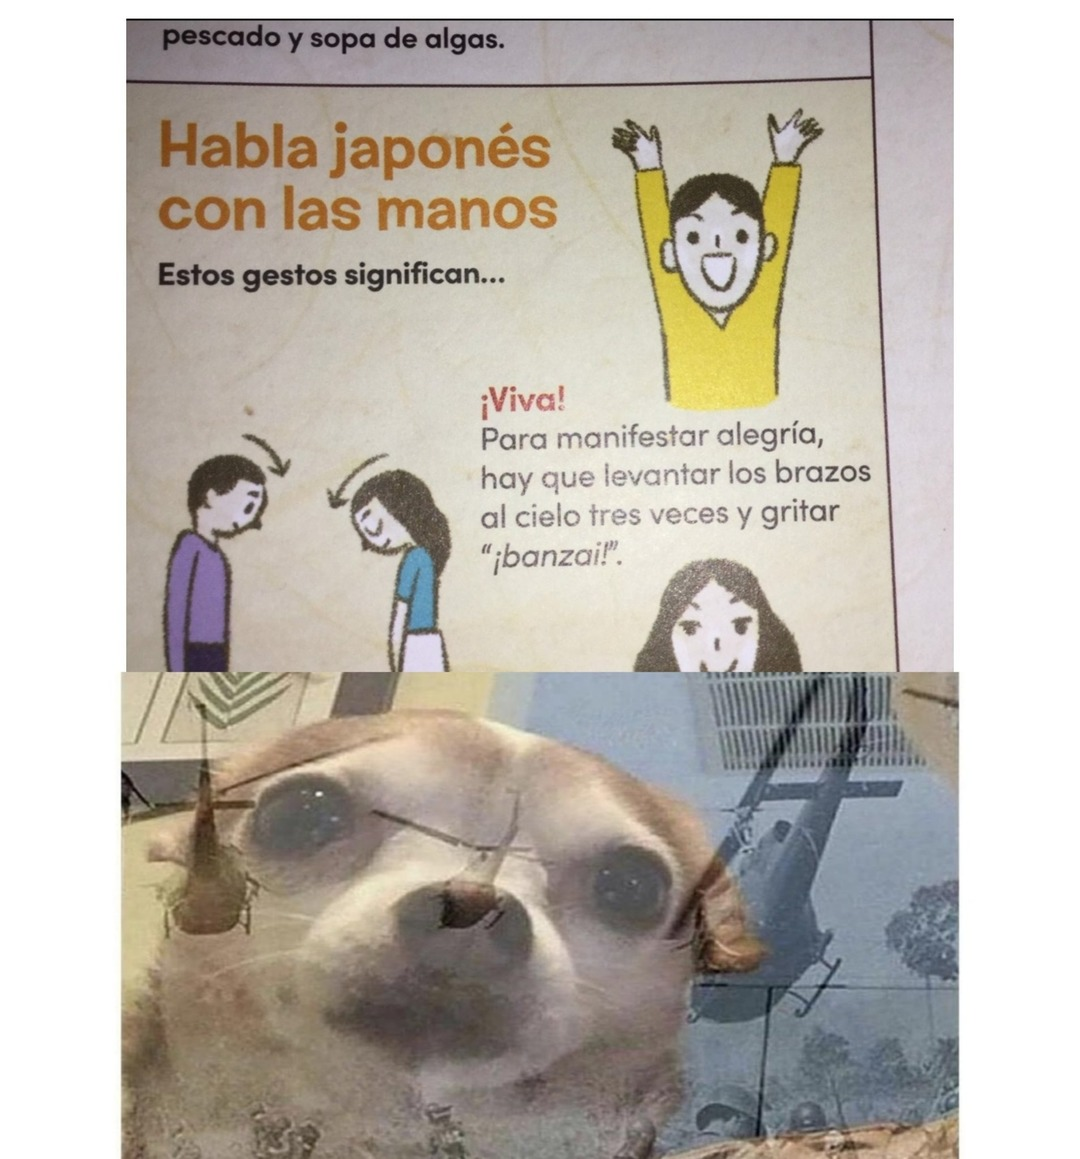 manos - meme